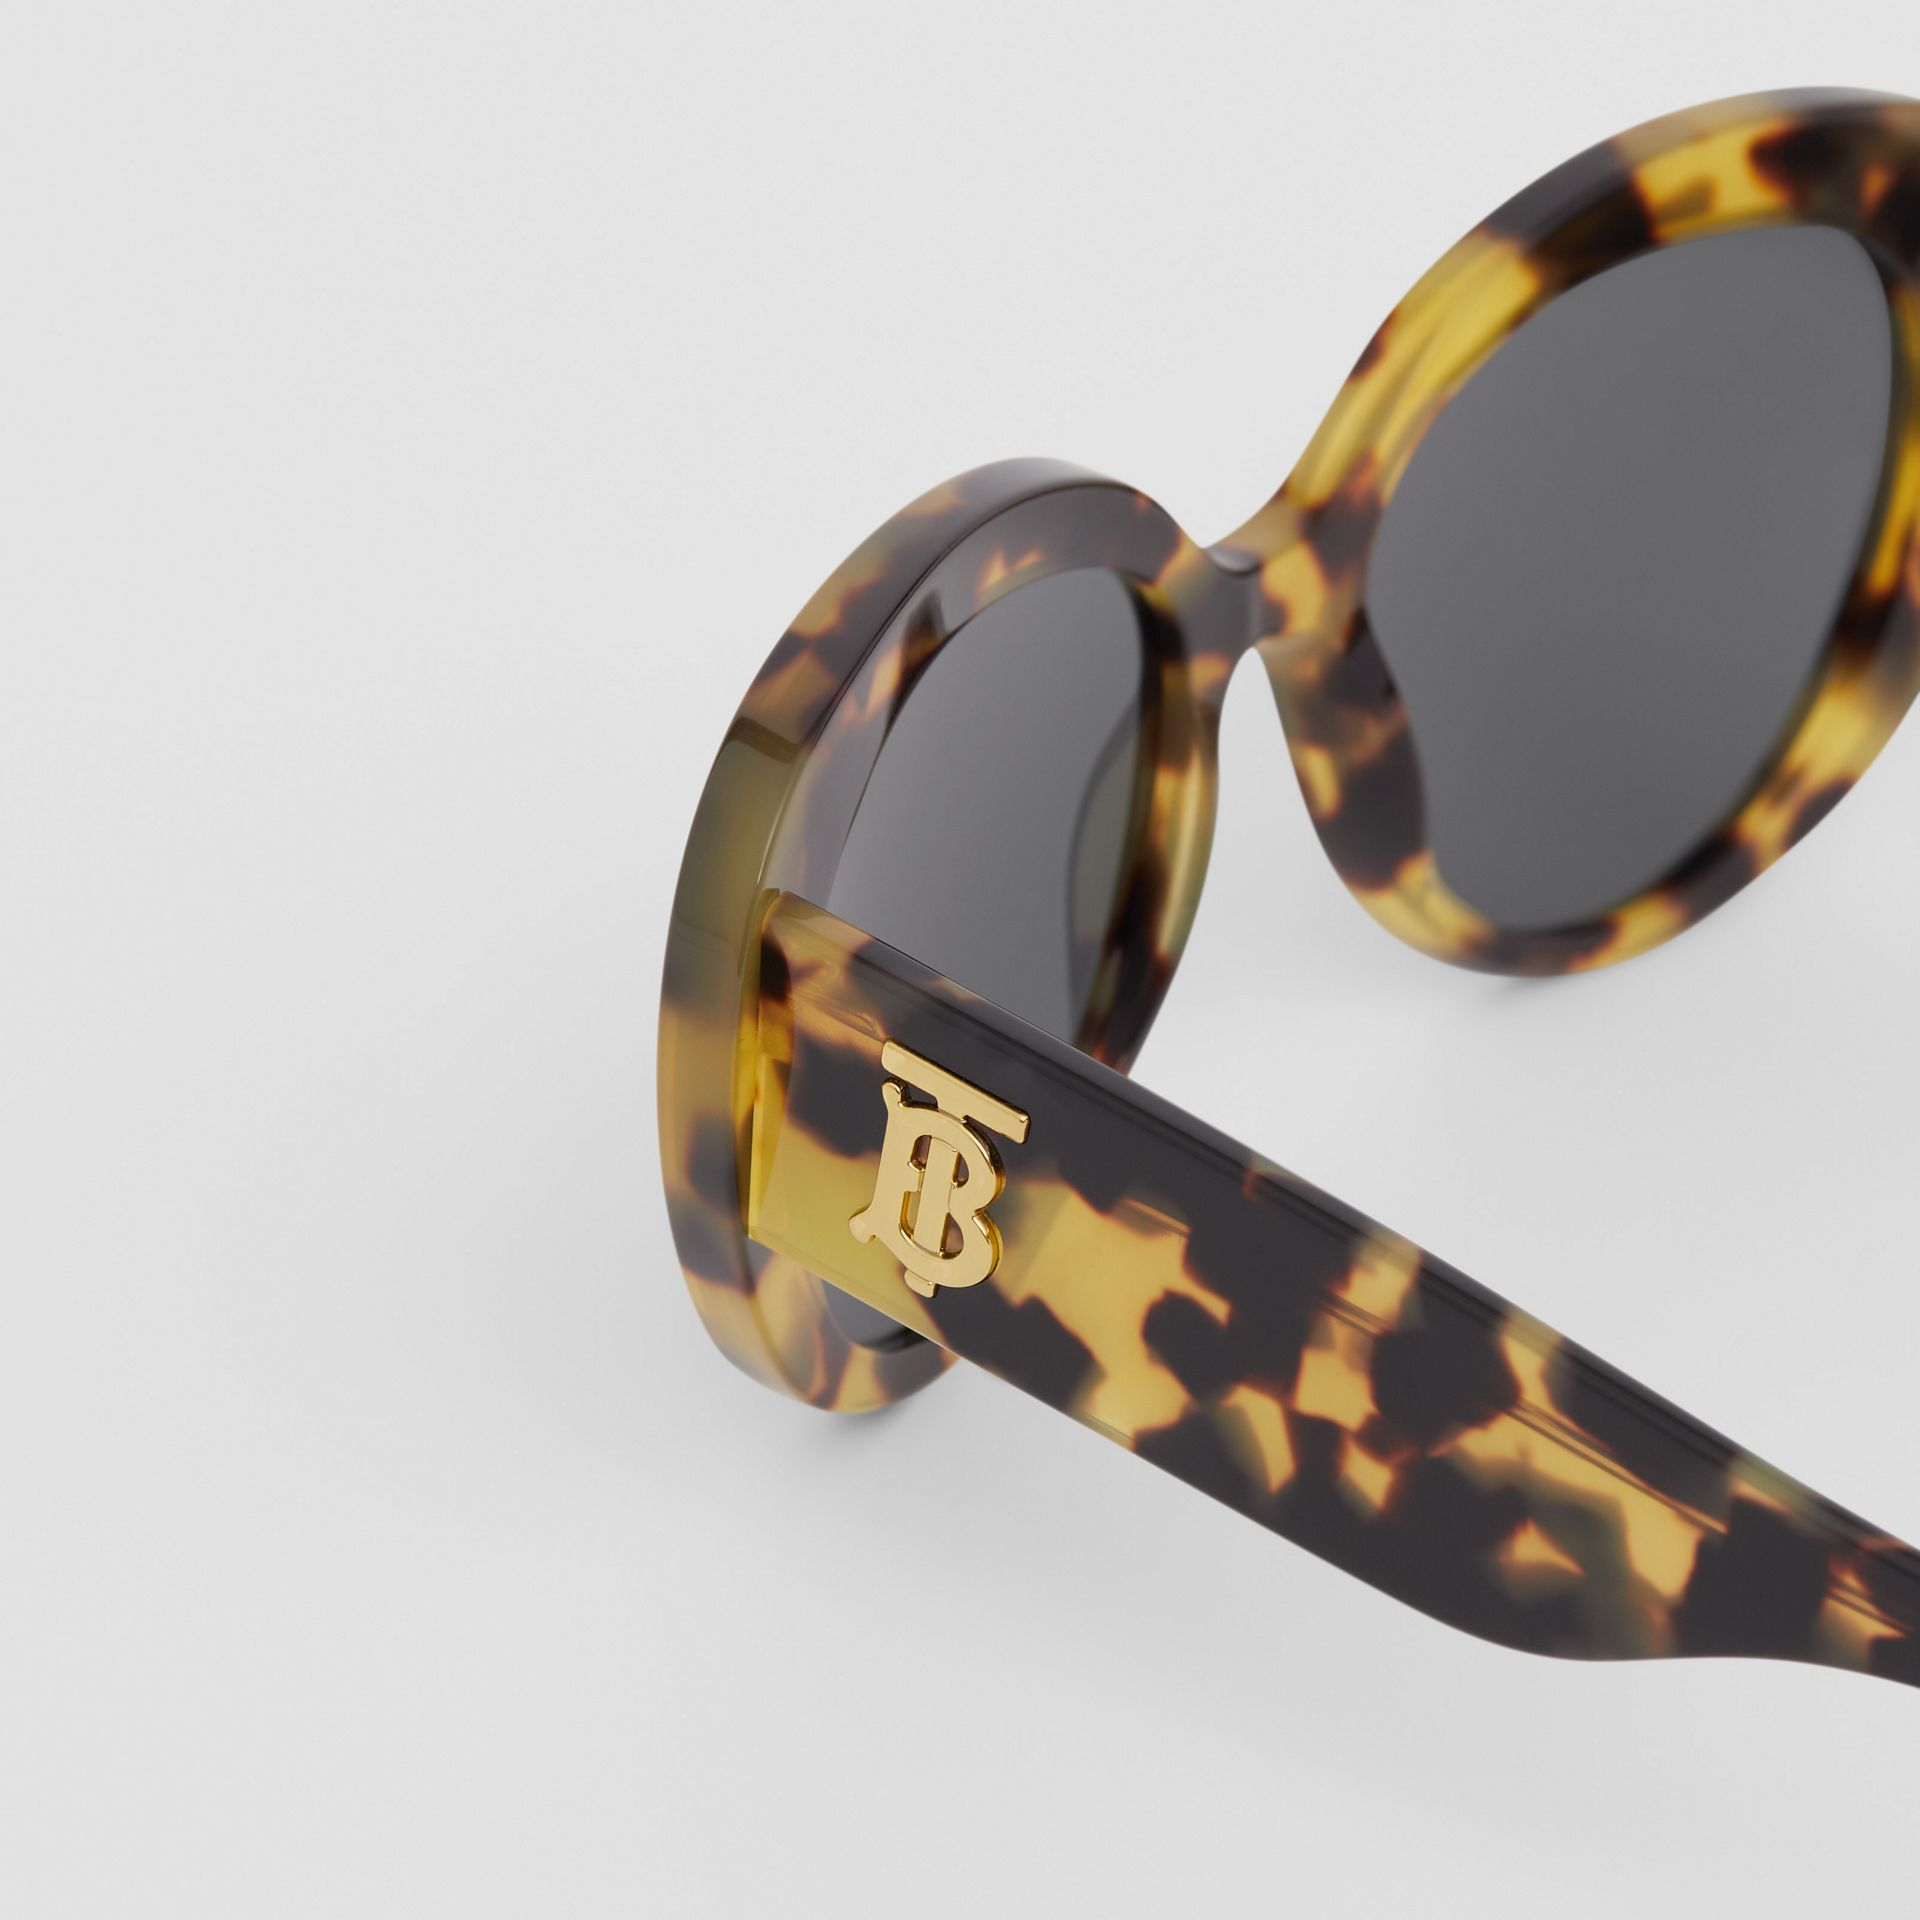 Monogram Motif Cat-eye Frame Sunglasses in Bright Tortoiseshell - Women | Burberry - gallery image 1